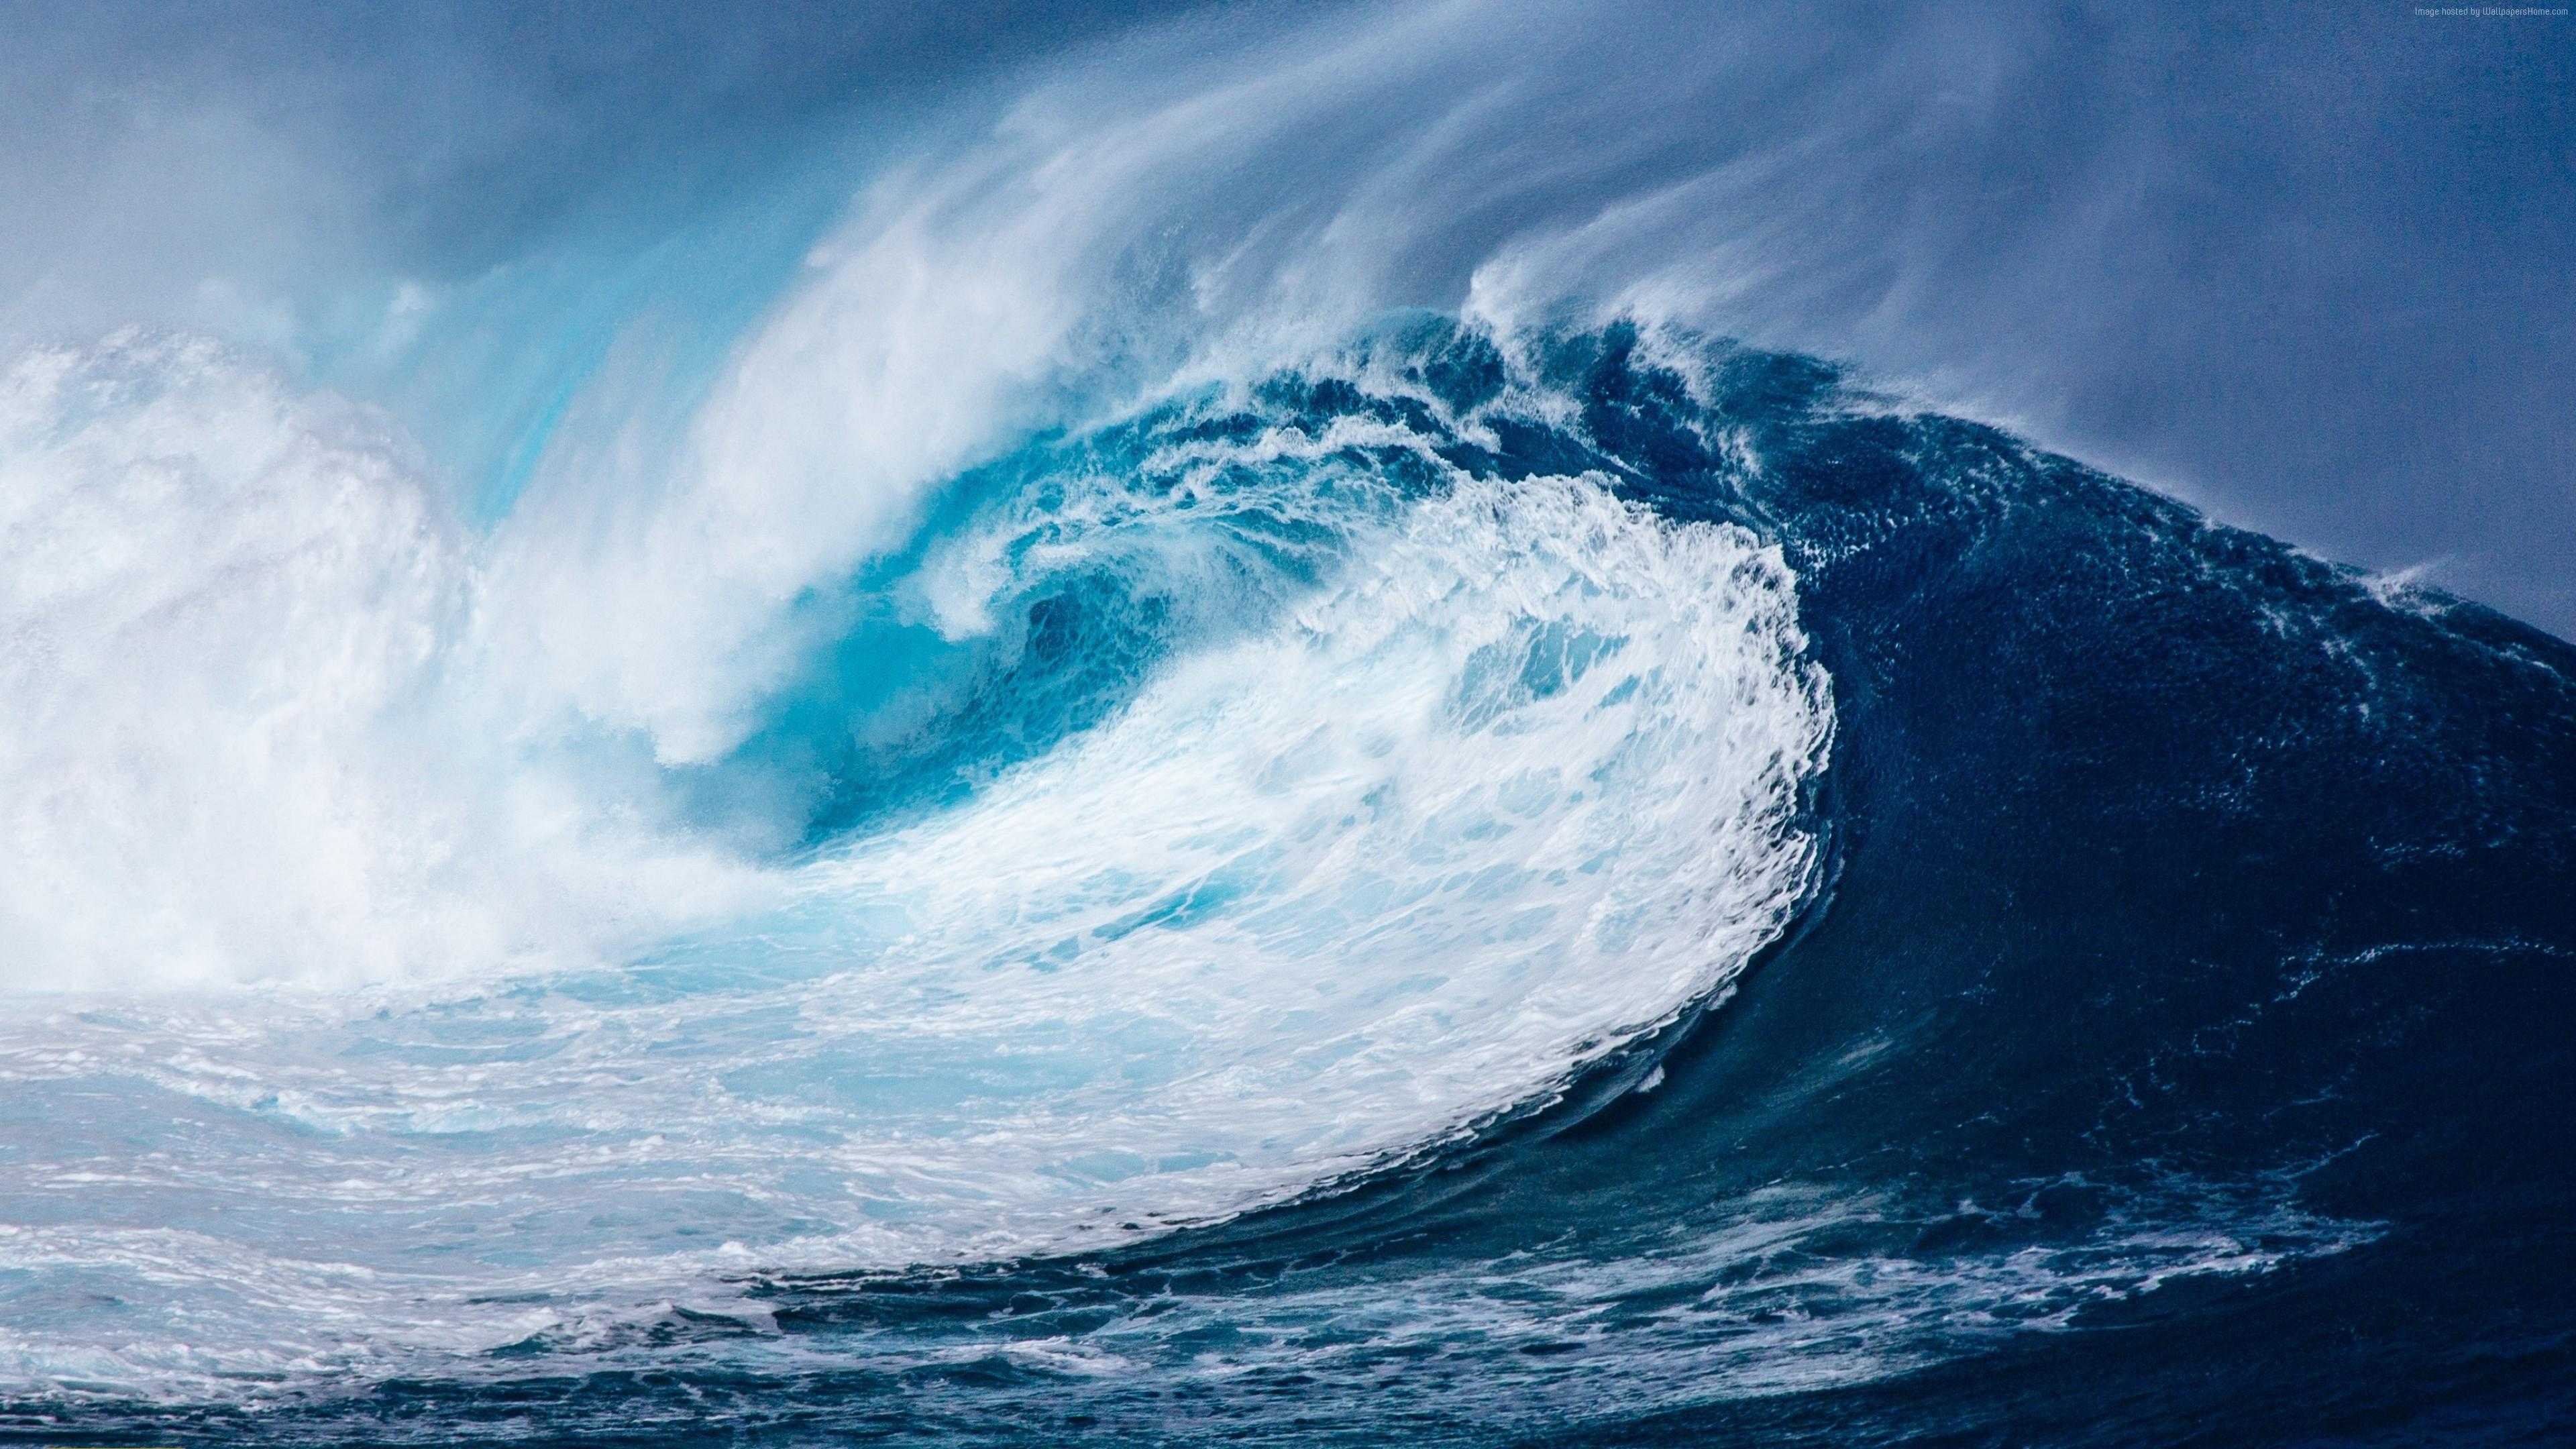 wallpaper wave, ocean, 4k, nature 4k, ocean, wave wallpaper download